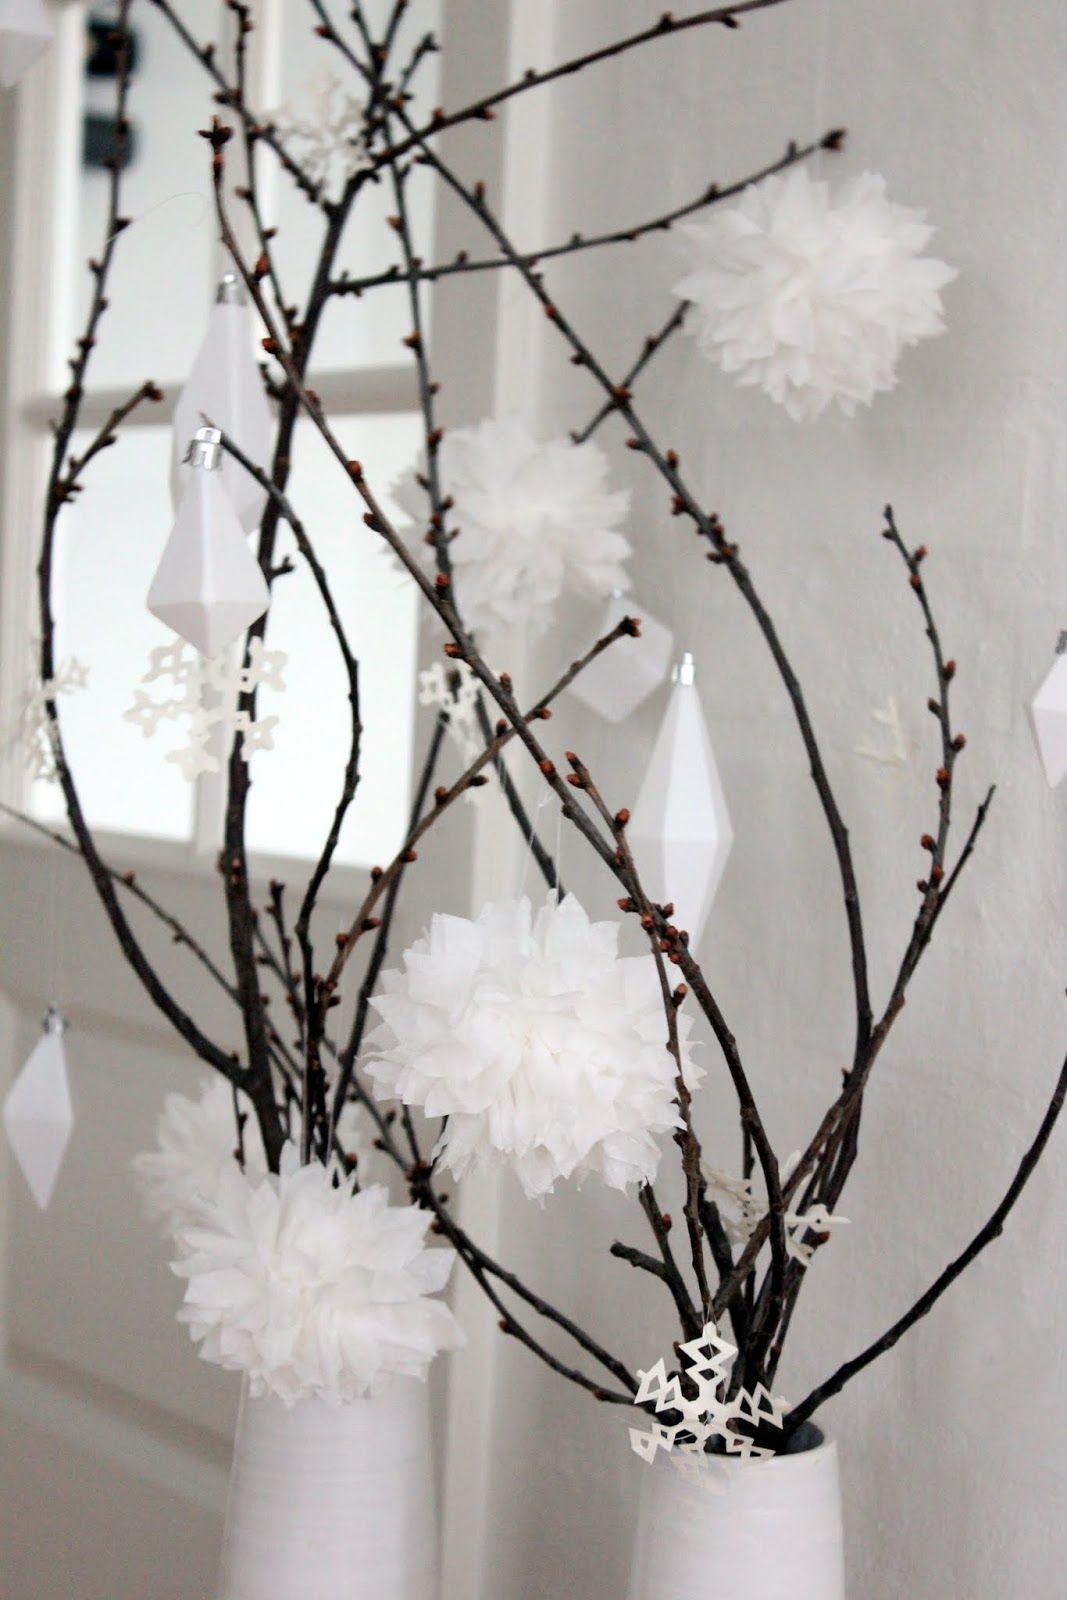 Wedding decorations garden theme december 2018 Billedresultat for julepynt diy  Jul  Pinterest